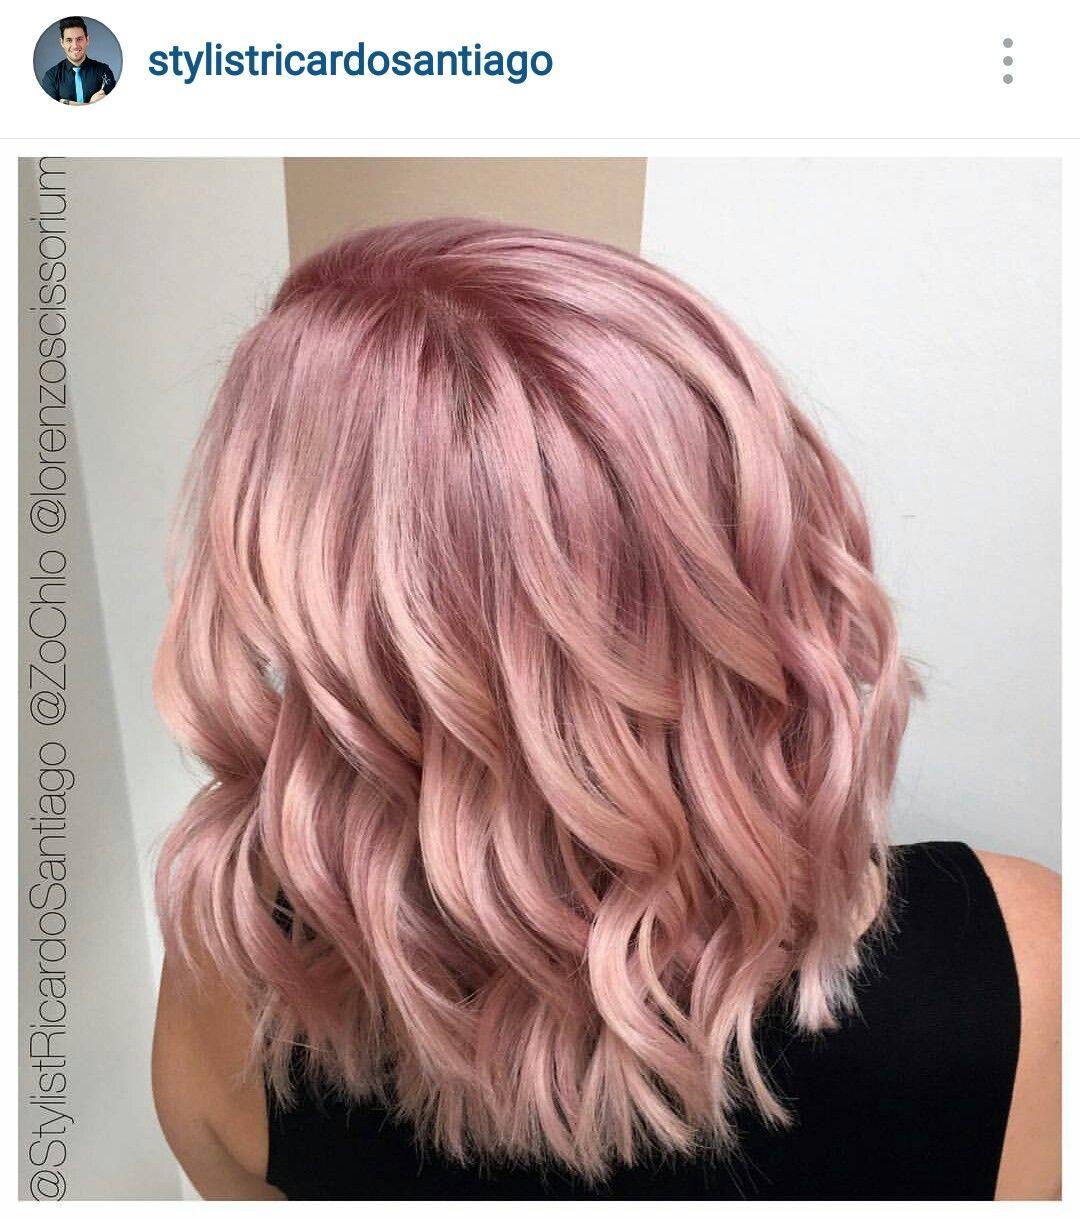 Domarleane hair land pinterest hair coloring hair style and